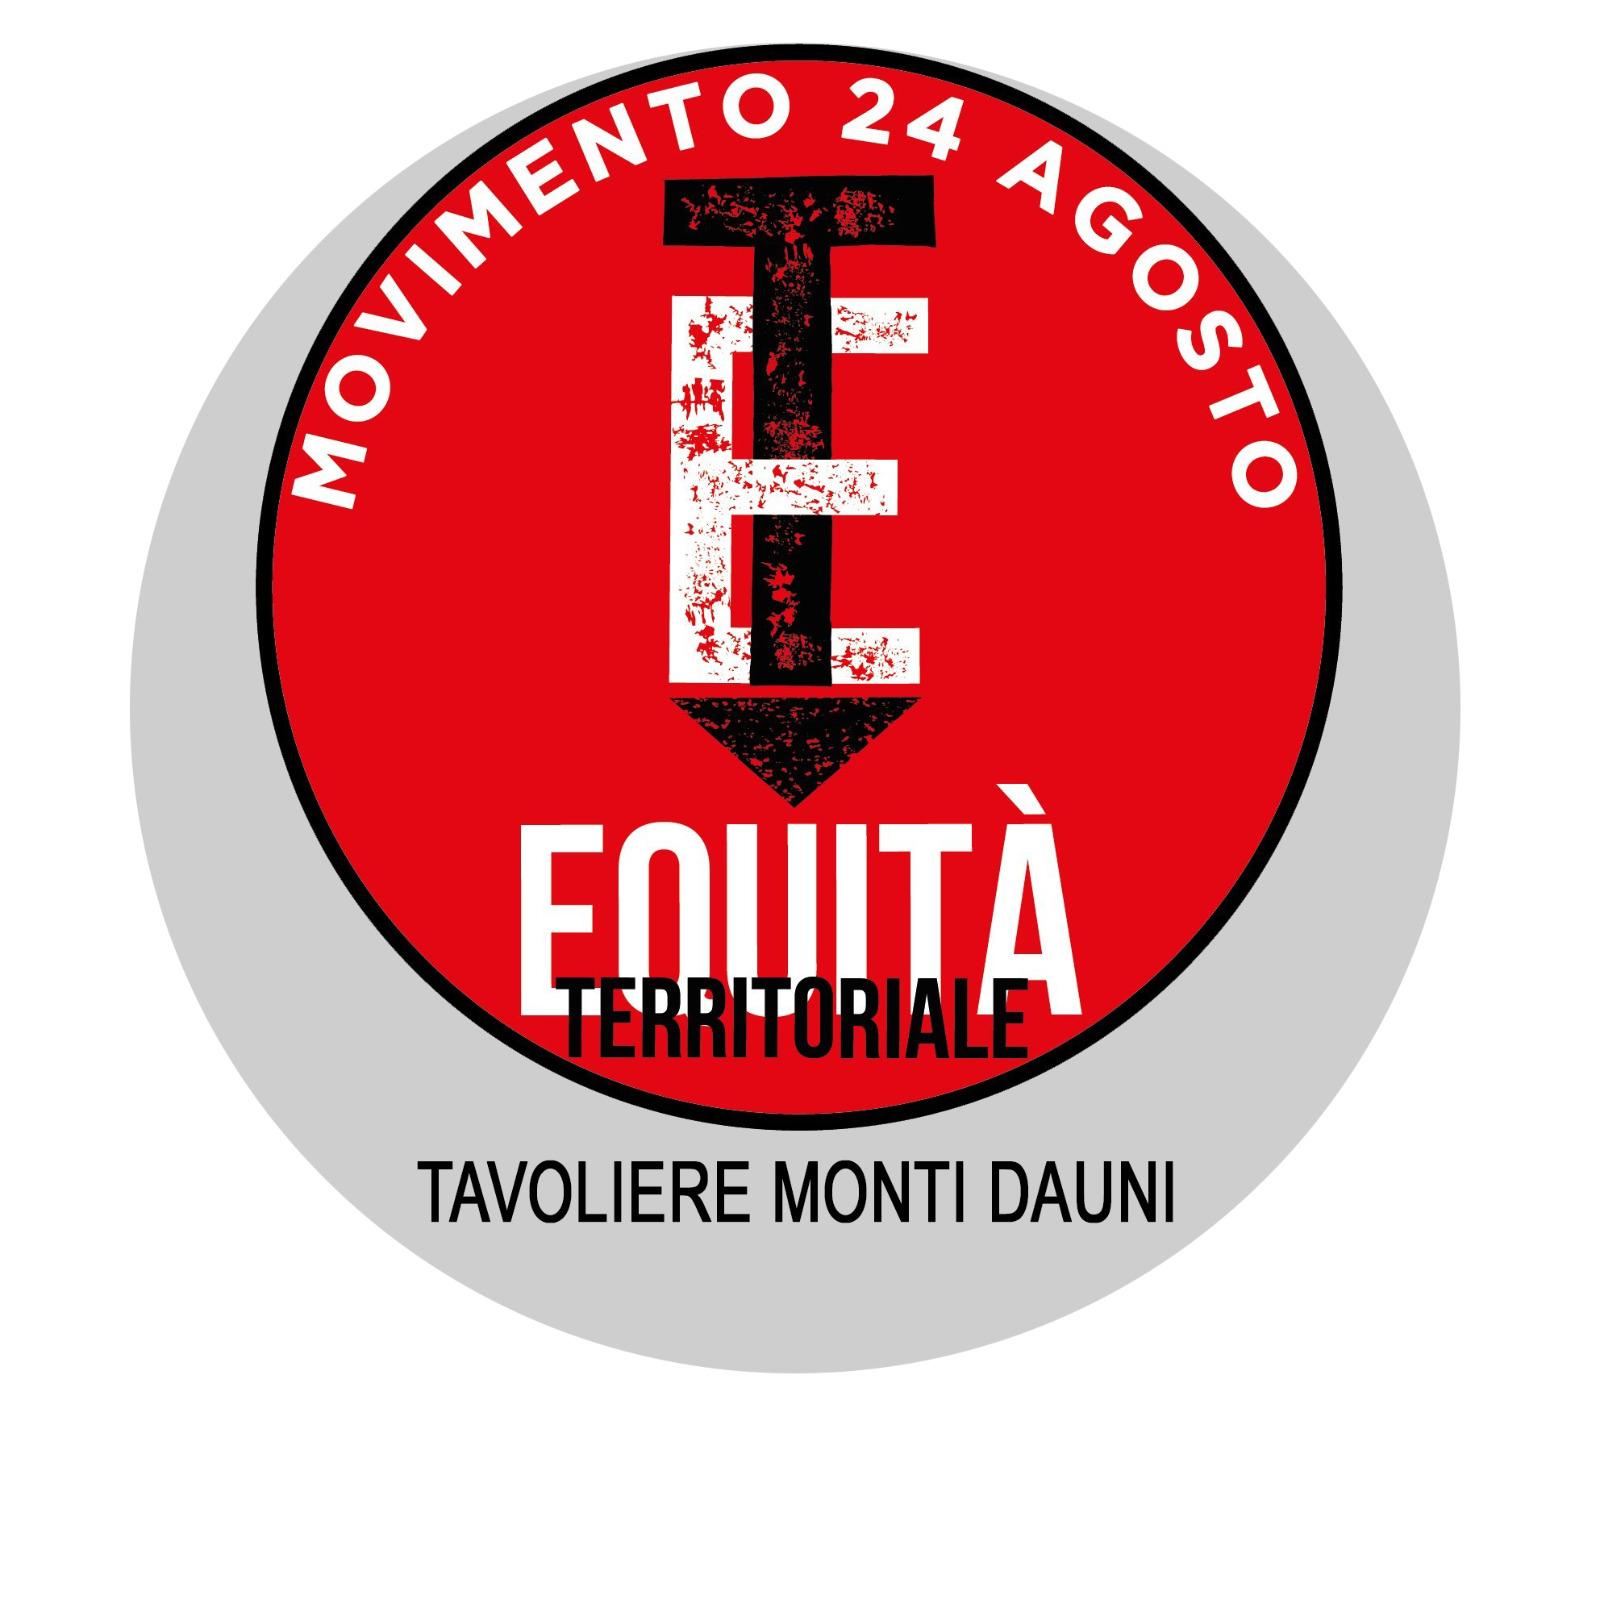 logo-fg.jpeg (1600×1600)